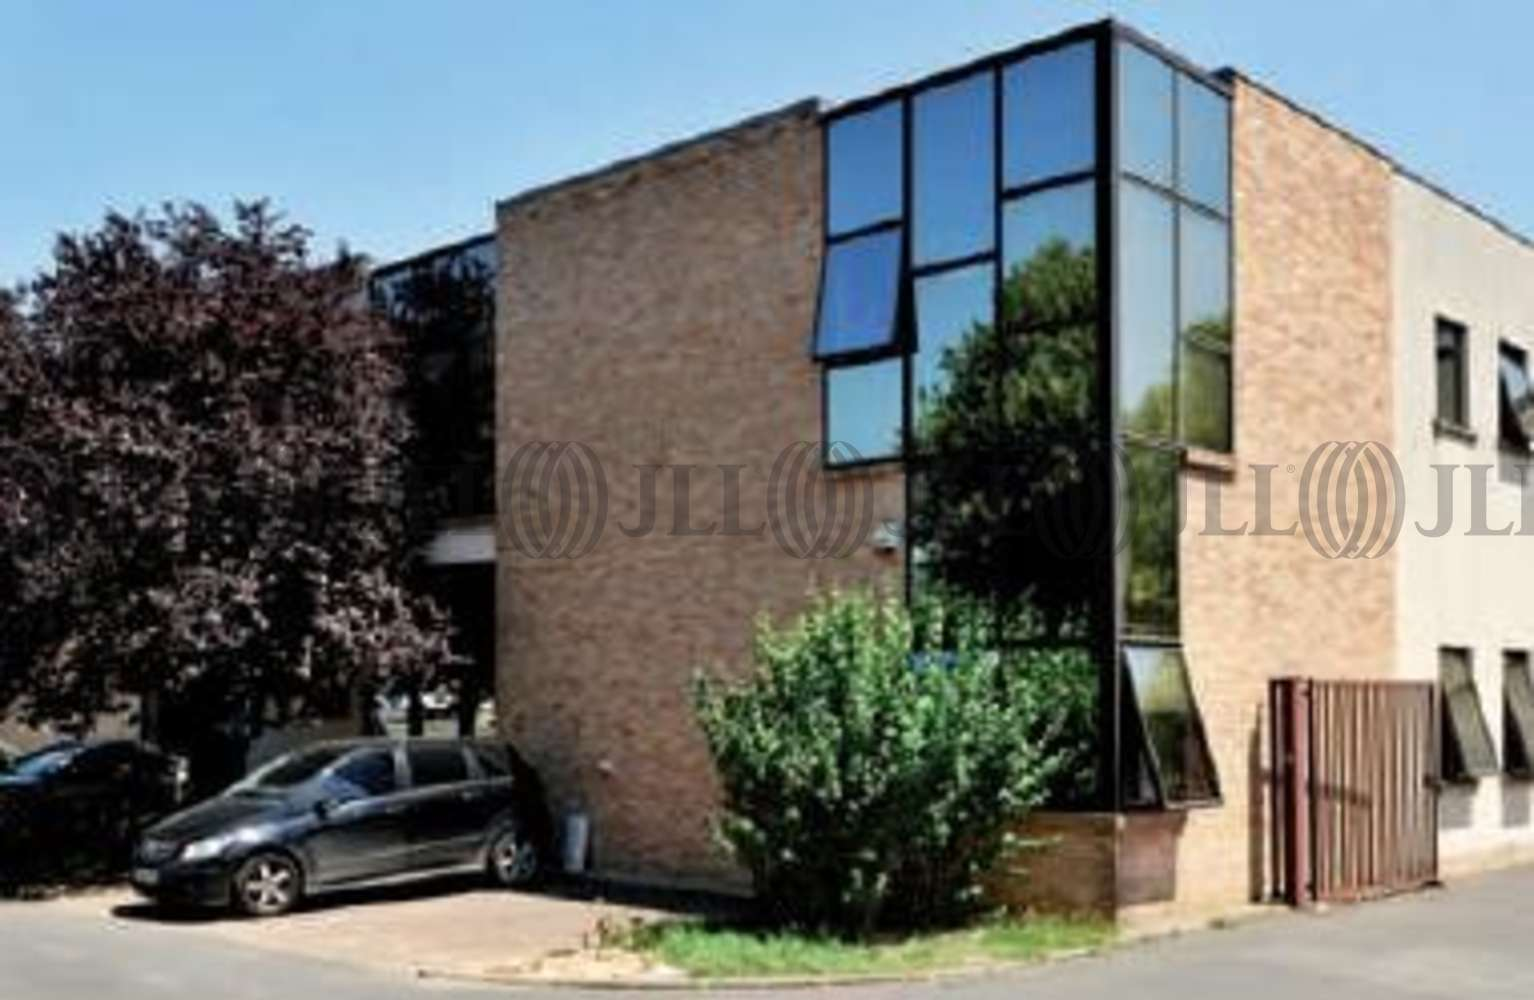 Activités/entrepôt Montmagny, 95360 - 201 RUE JULES FERRY - 9447716